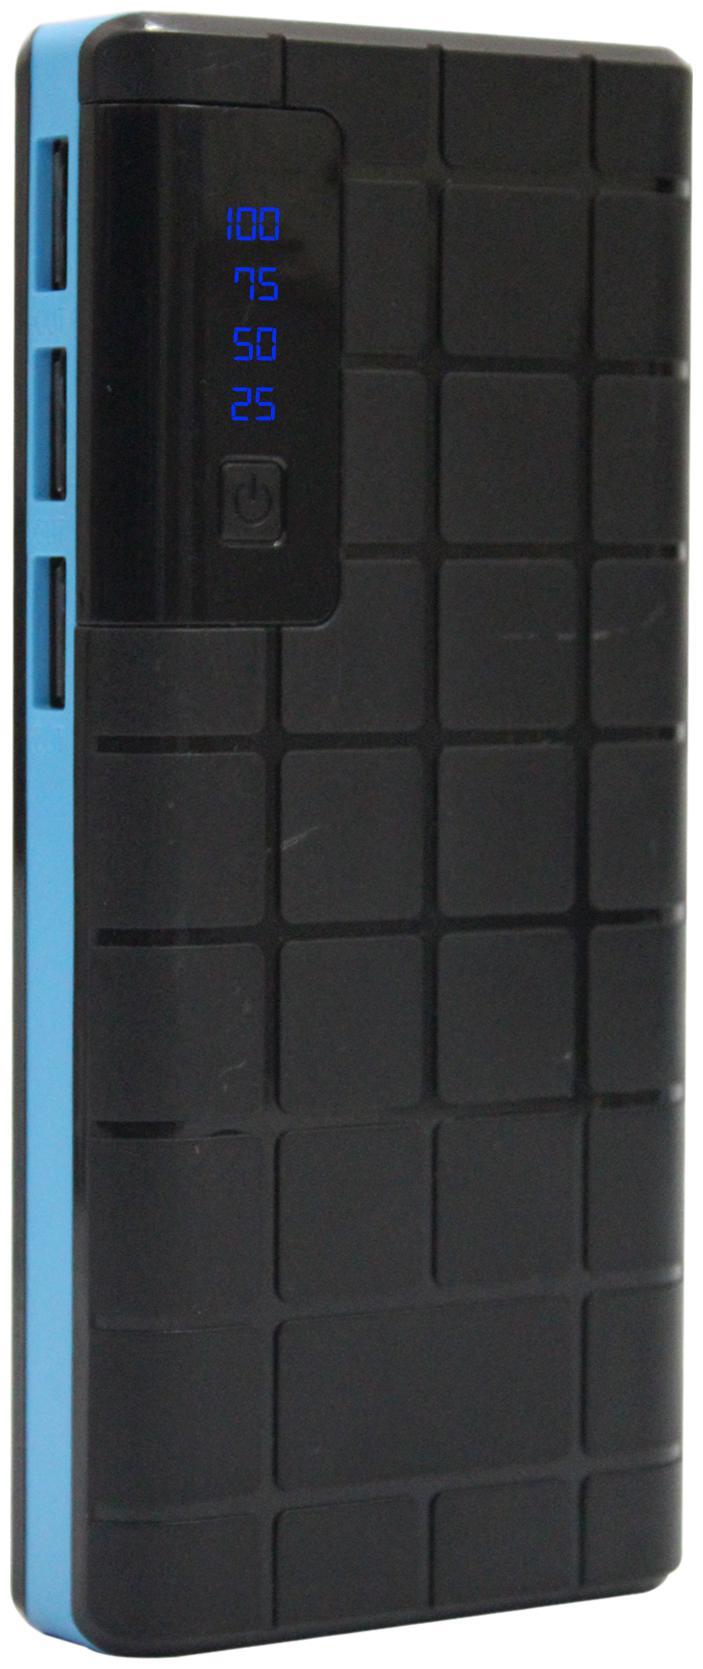 POMICS 15K Choco 15000 mAh Portable Power Bank - Blue & Black